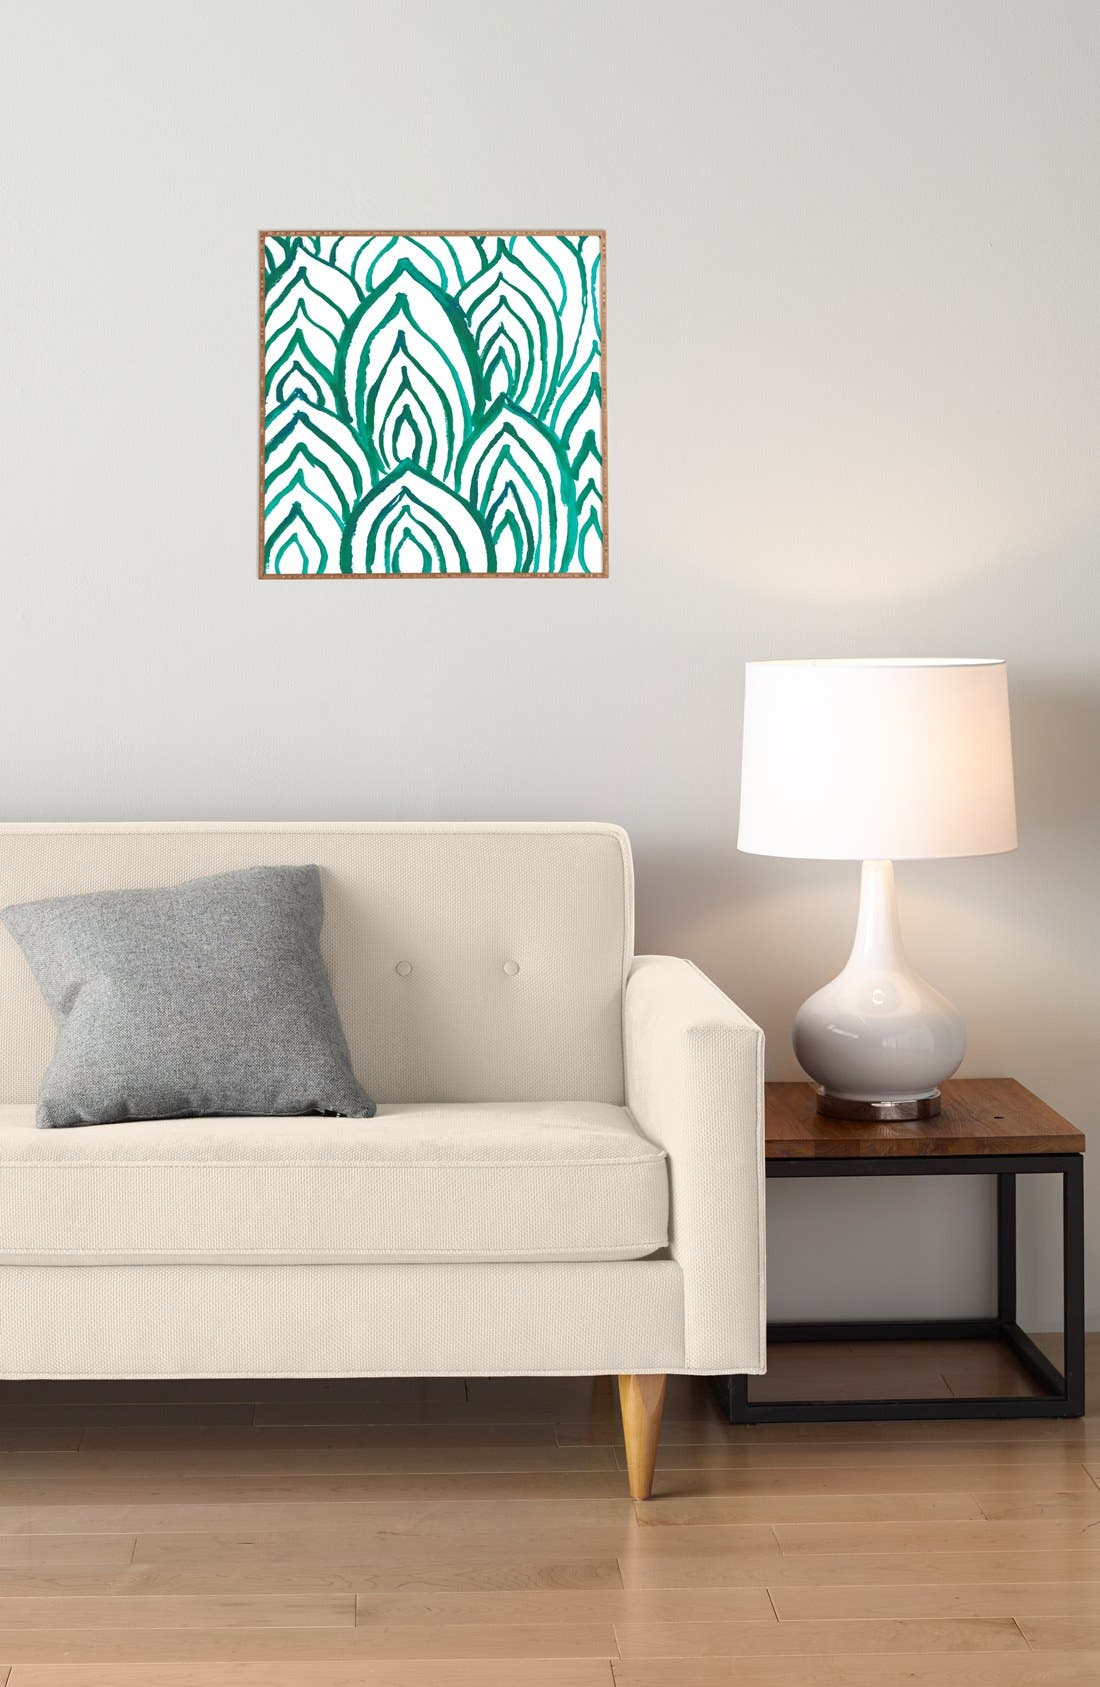 DENY DESIGNS, 'Emerald Coast' Framed Wall Art, Alternate thumbnail 3, color, 300